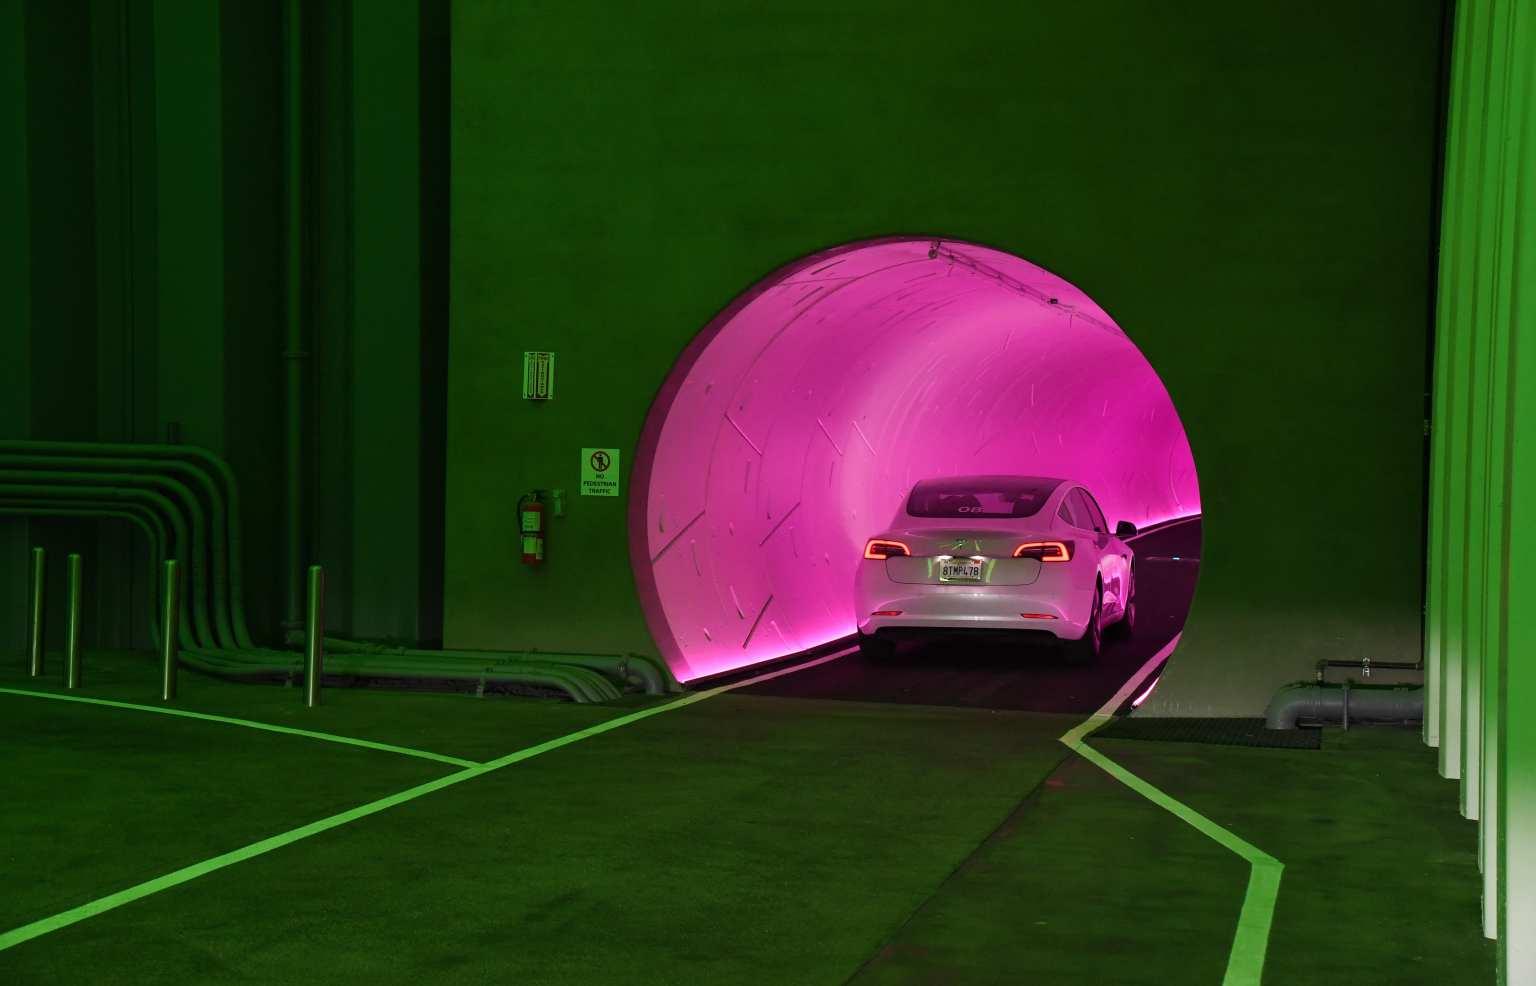 Elon Musk's Las Vegas tunnel